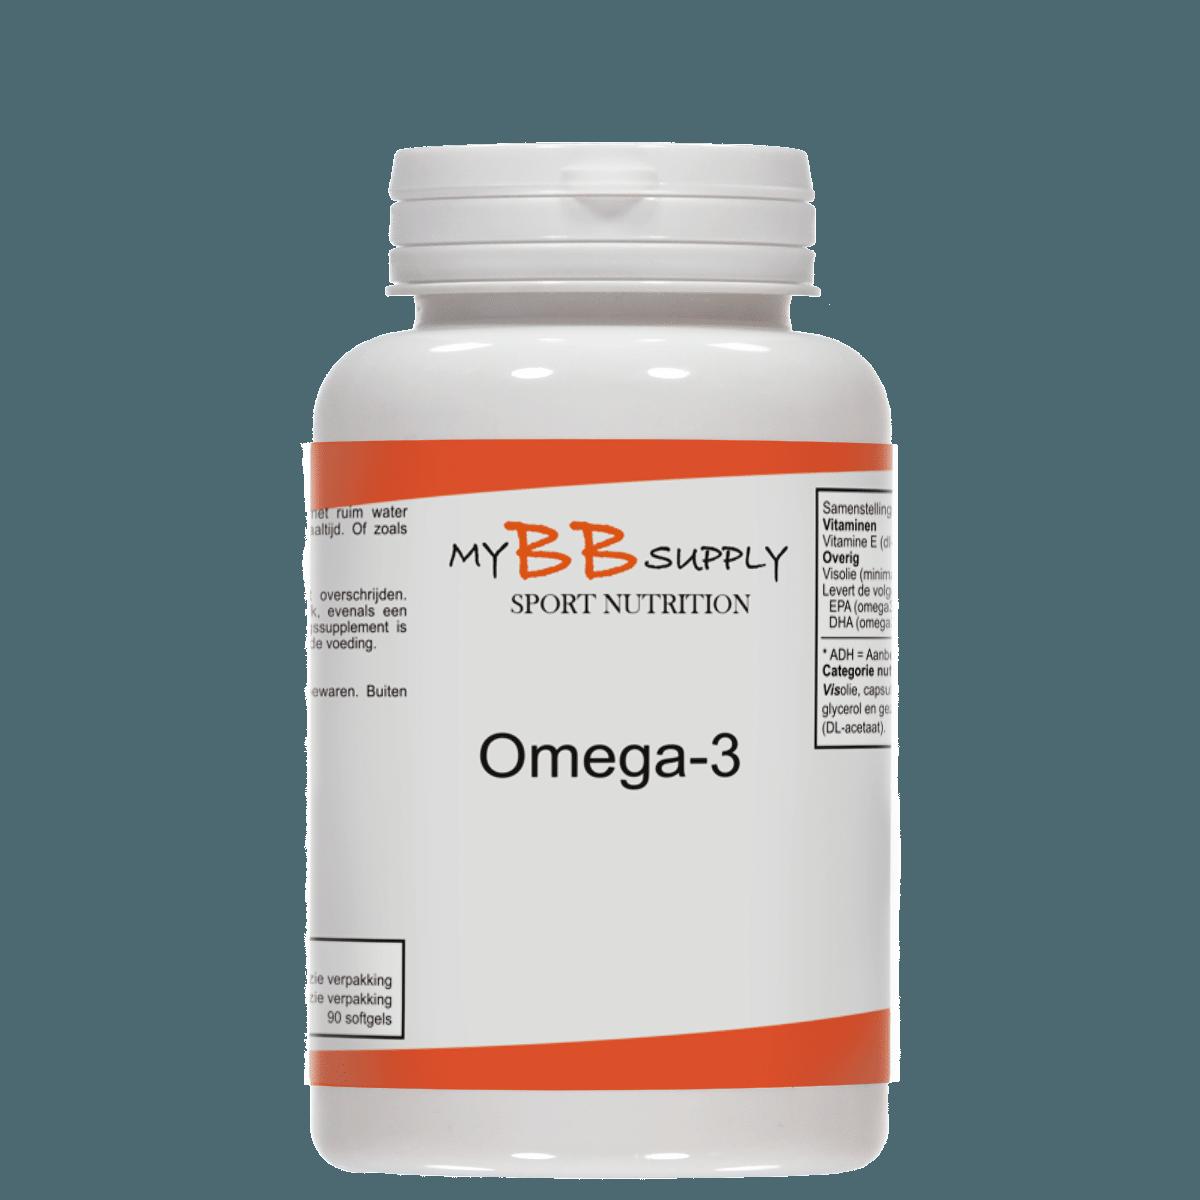 MyBBSupply Omega 3